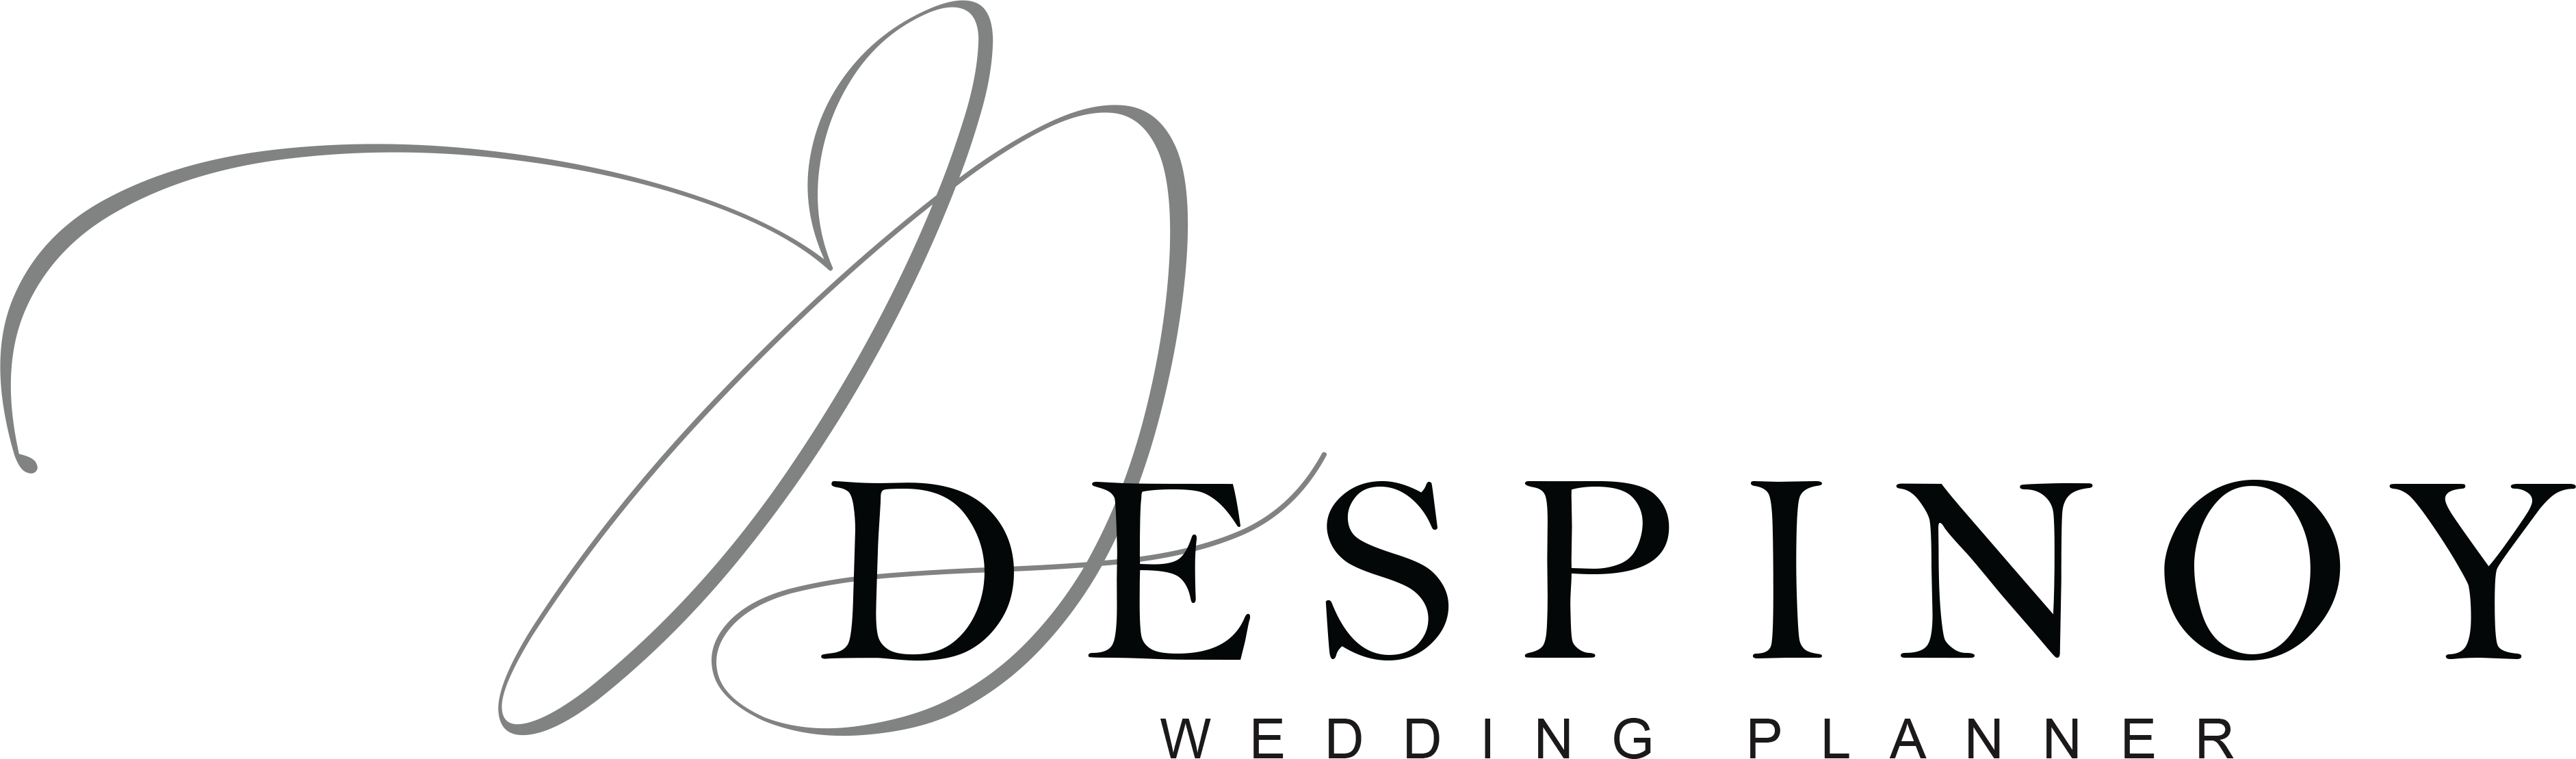 despinoy-wedding-planner-provence-france-logo-hd-black